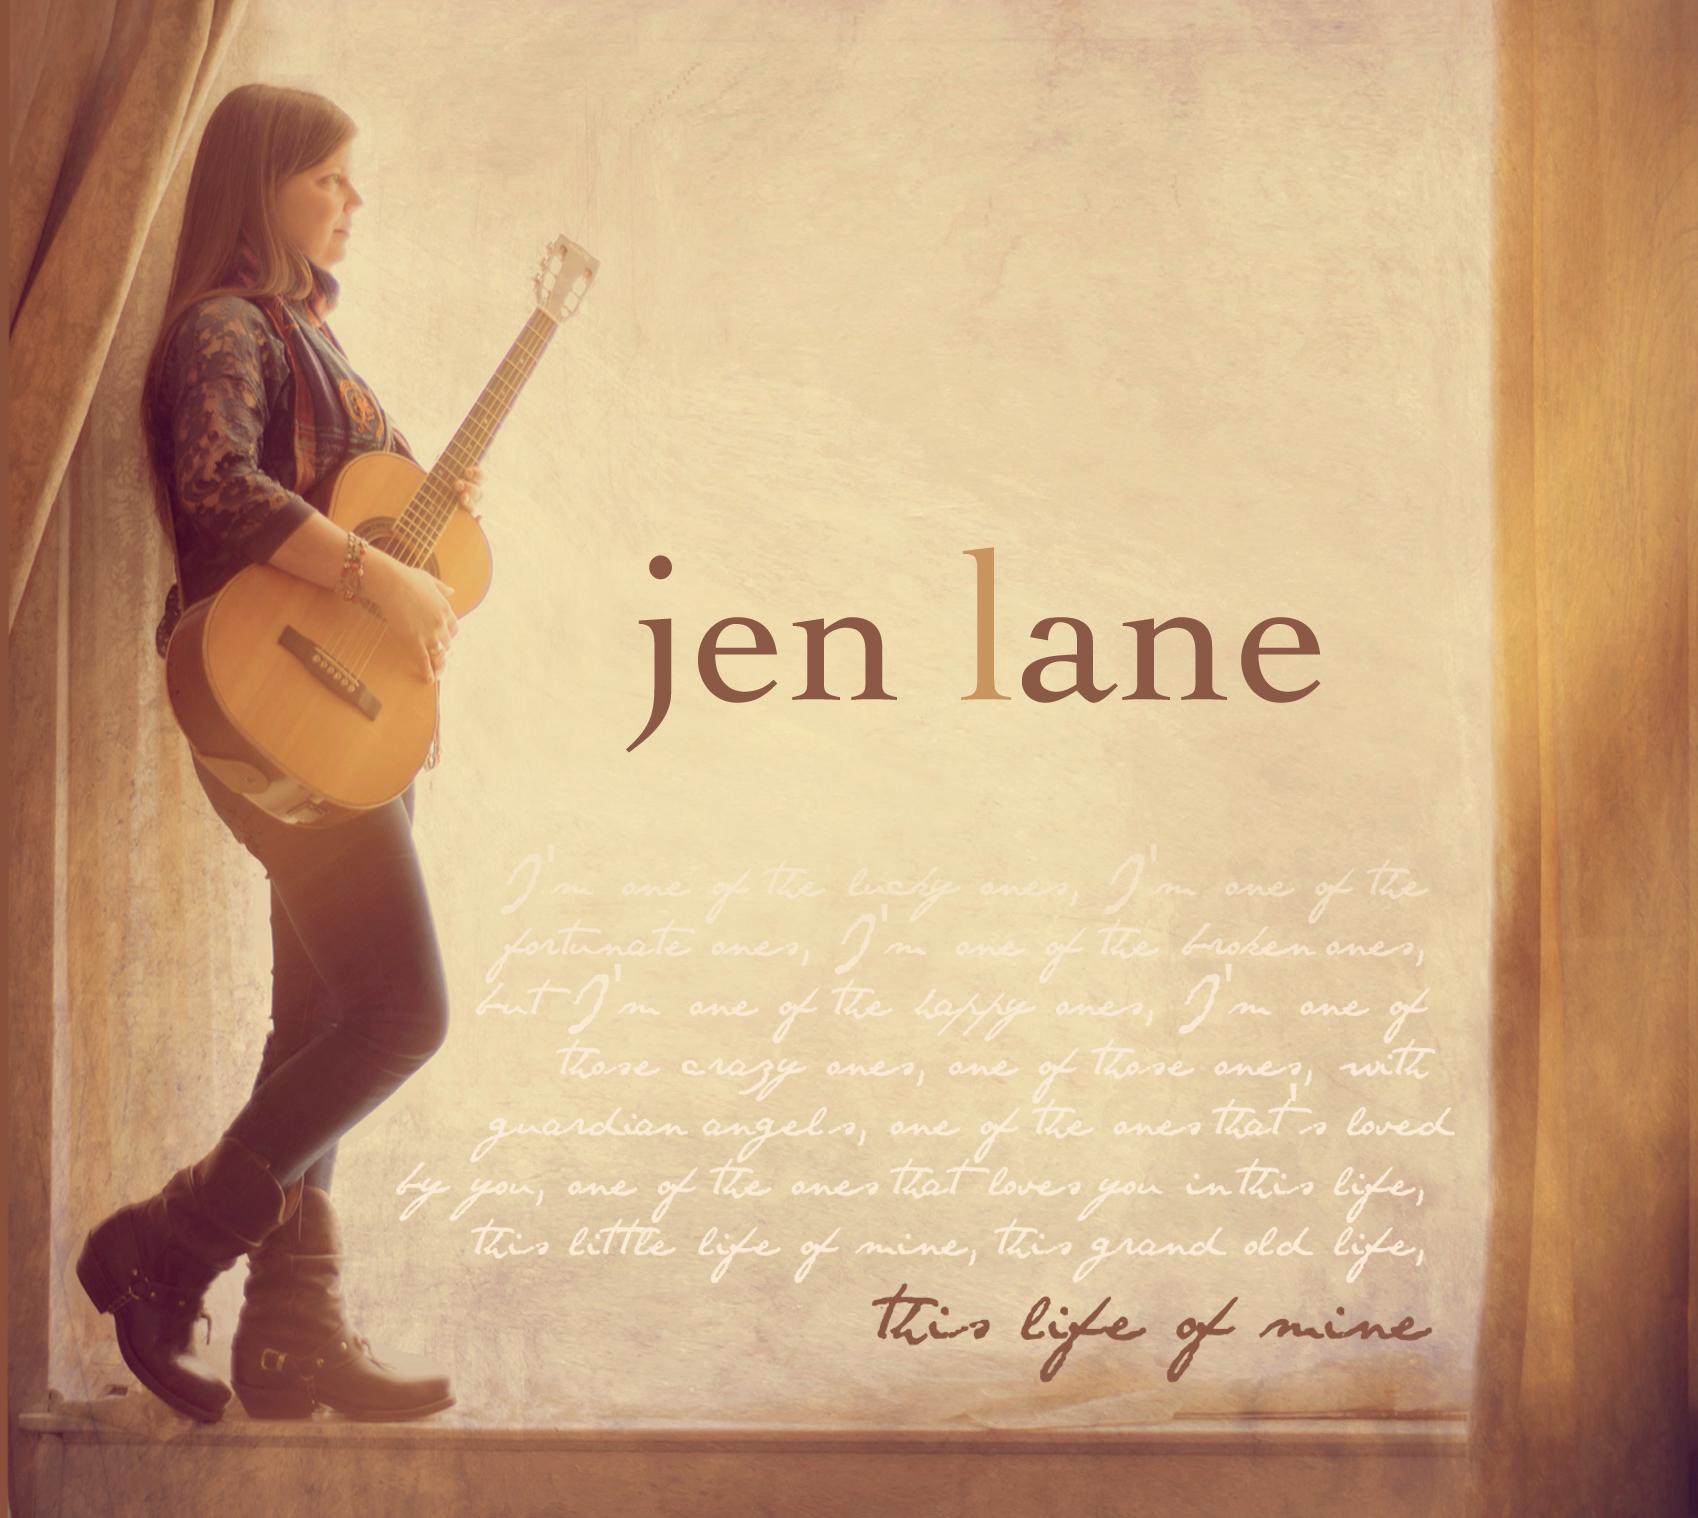 Jen Lane - Lyrics